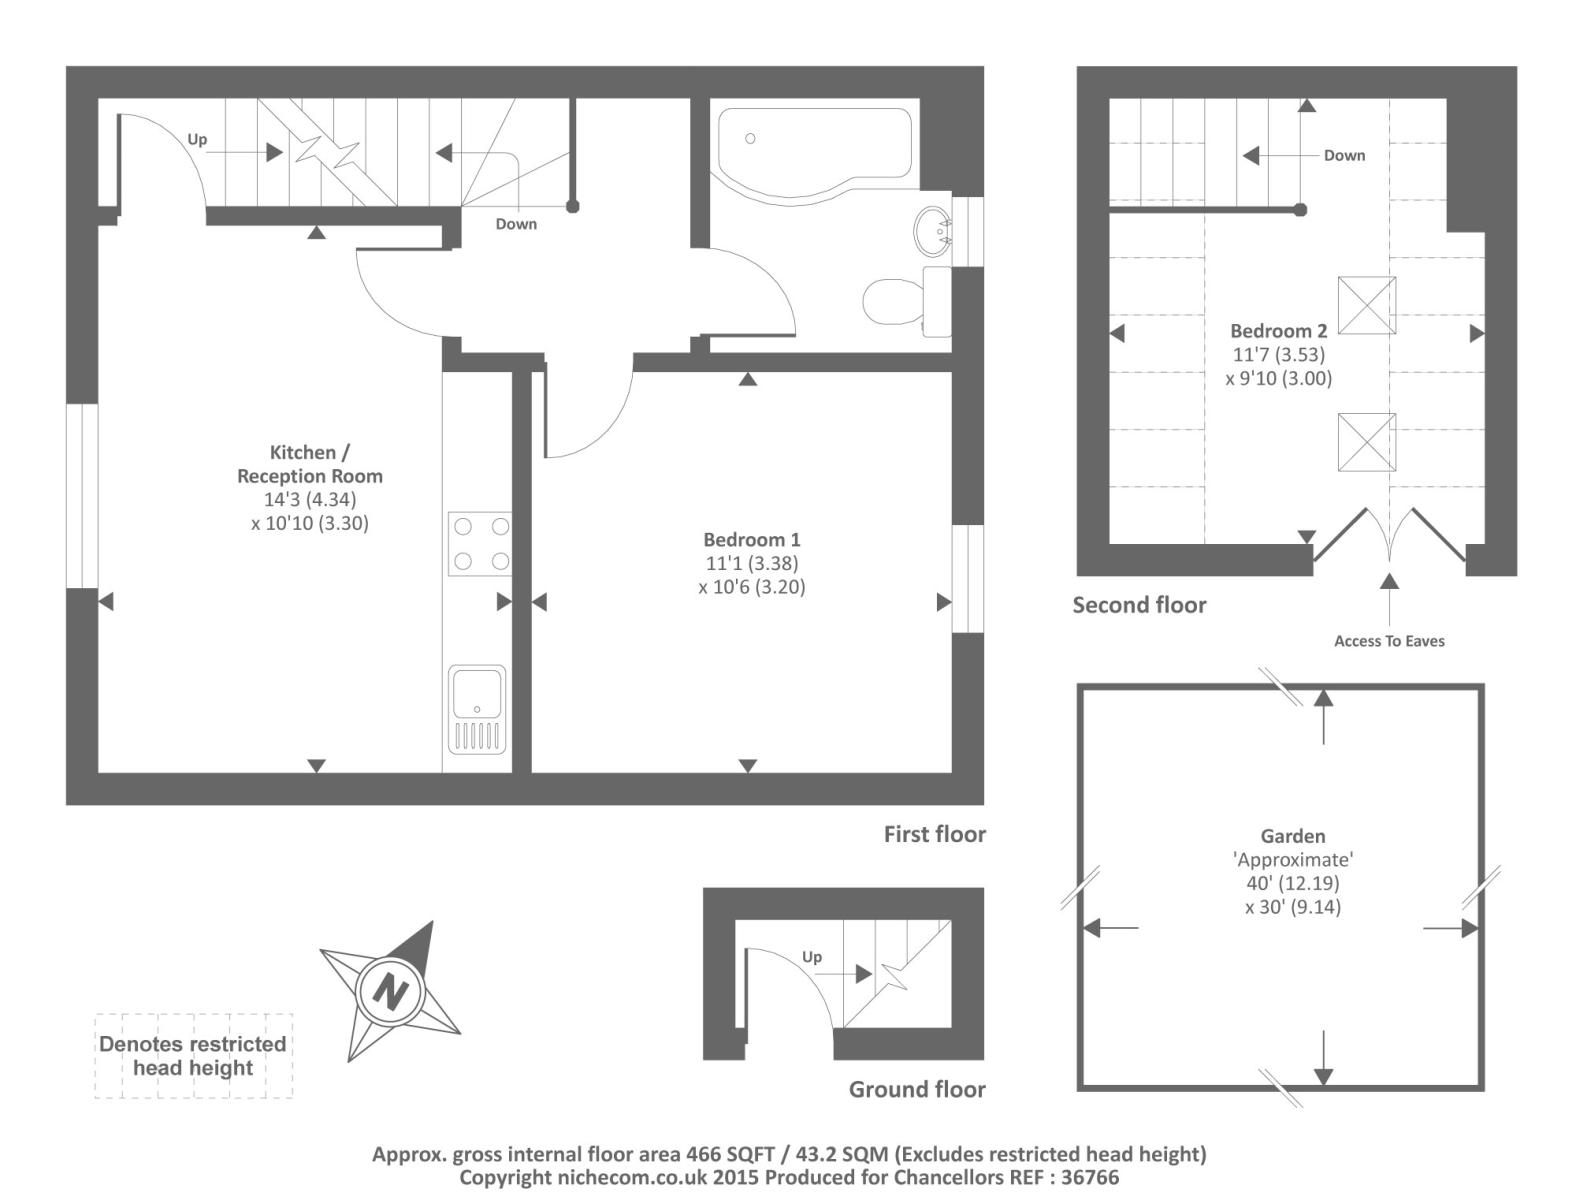 Up Down Duplex Floor Plans Home Design Inspirations